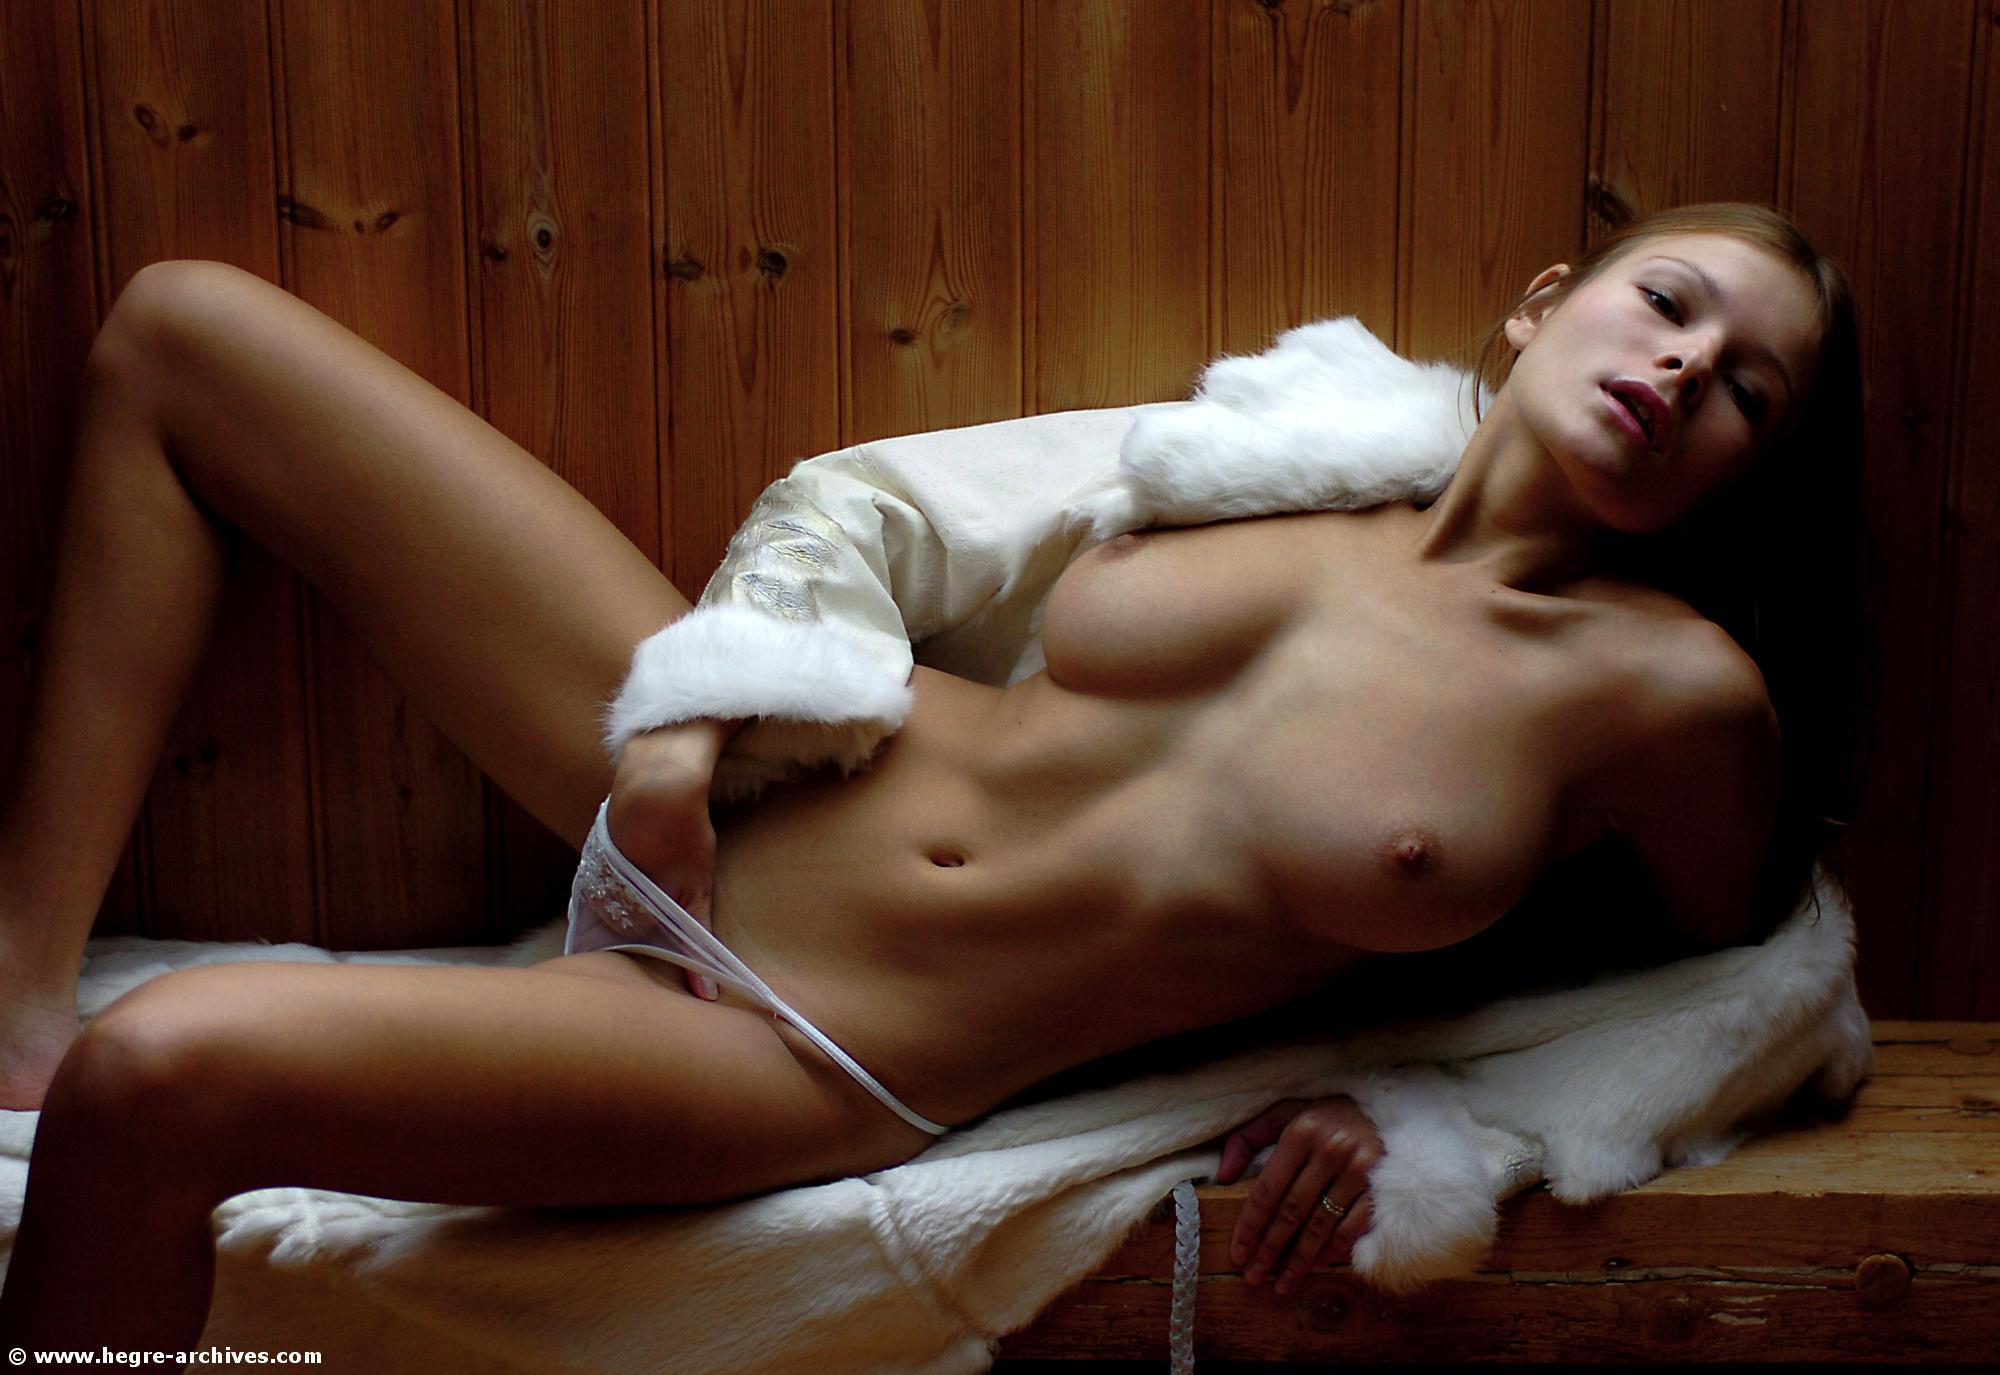 emmanuelle vaugier nude pics